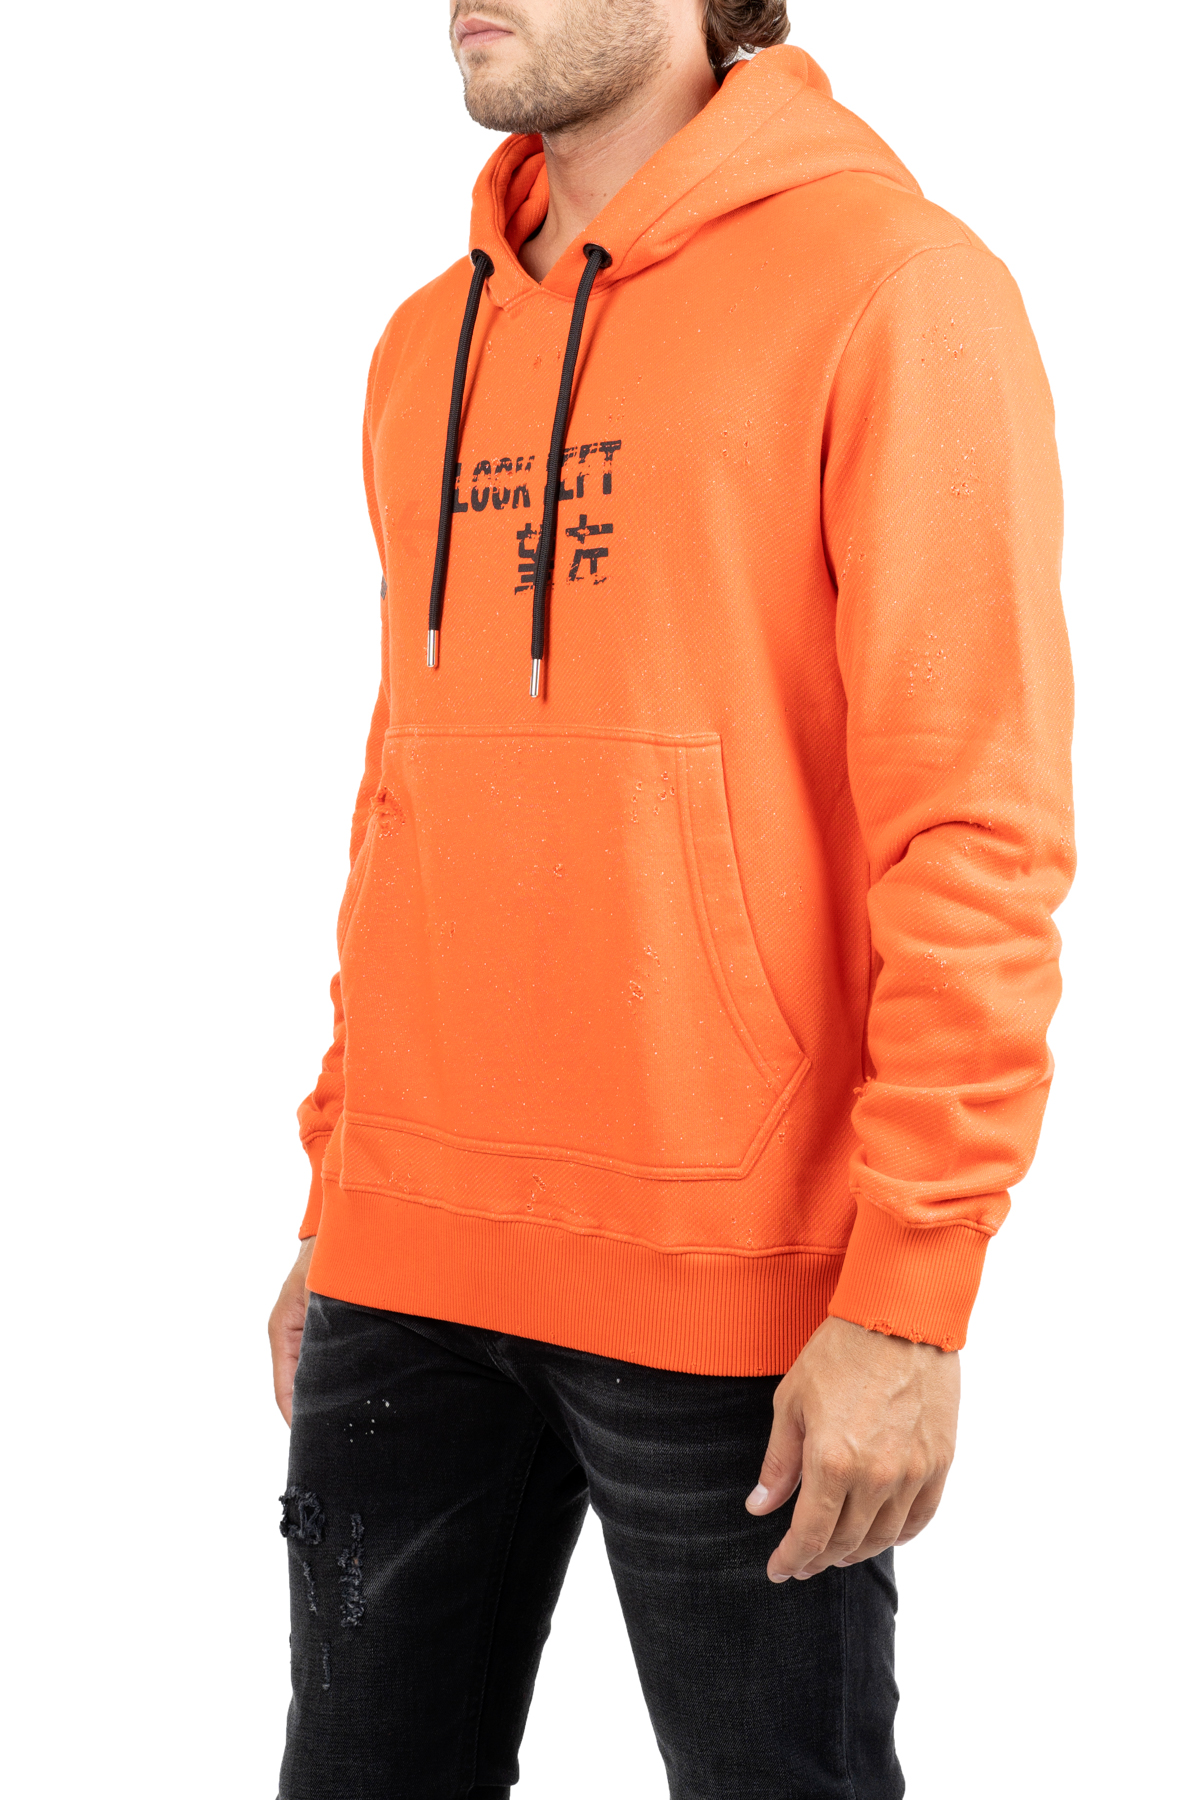 SWEATSHIRT IN COTTON ARANACION WITH LOGO ON RIGHT ARM LES HOMMES | Sweatshirts | UHH402757P5209